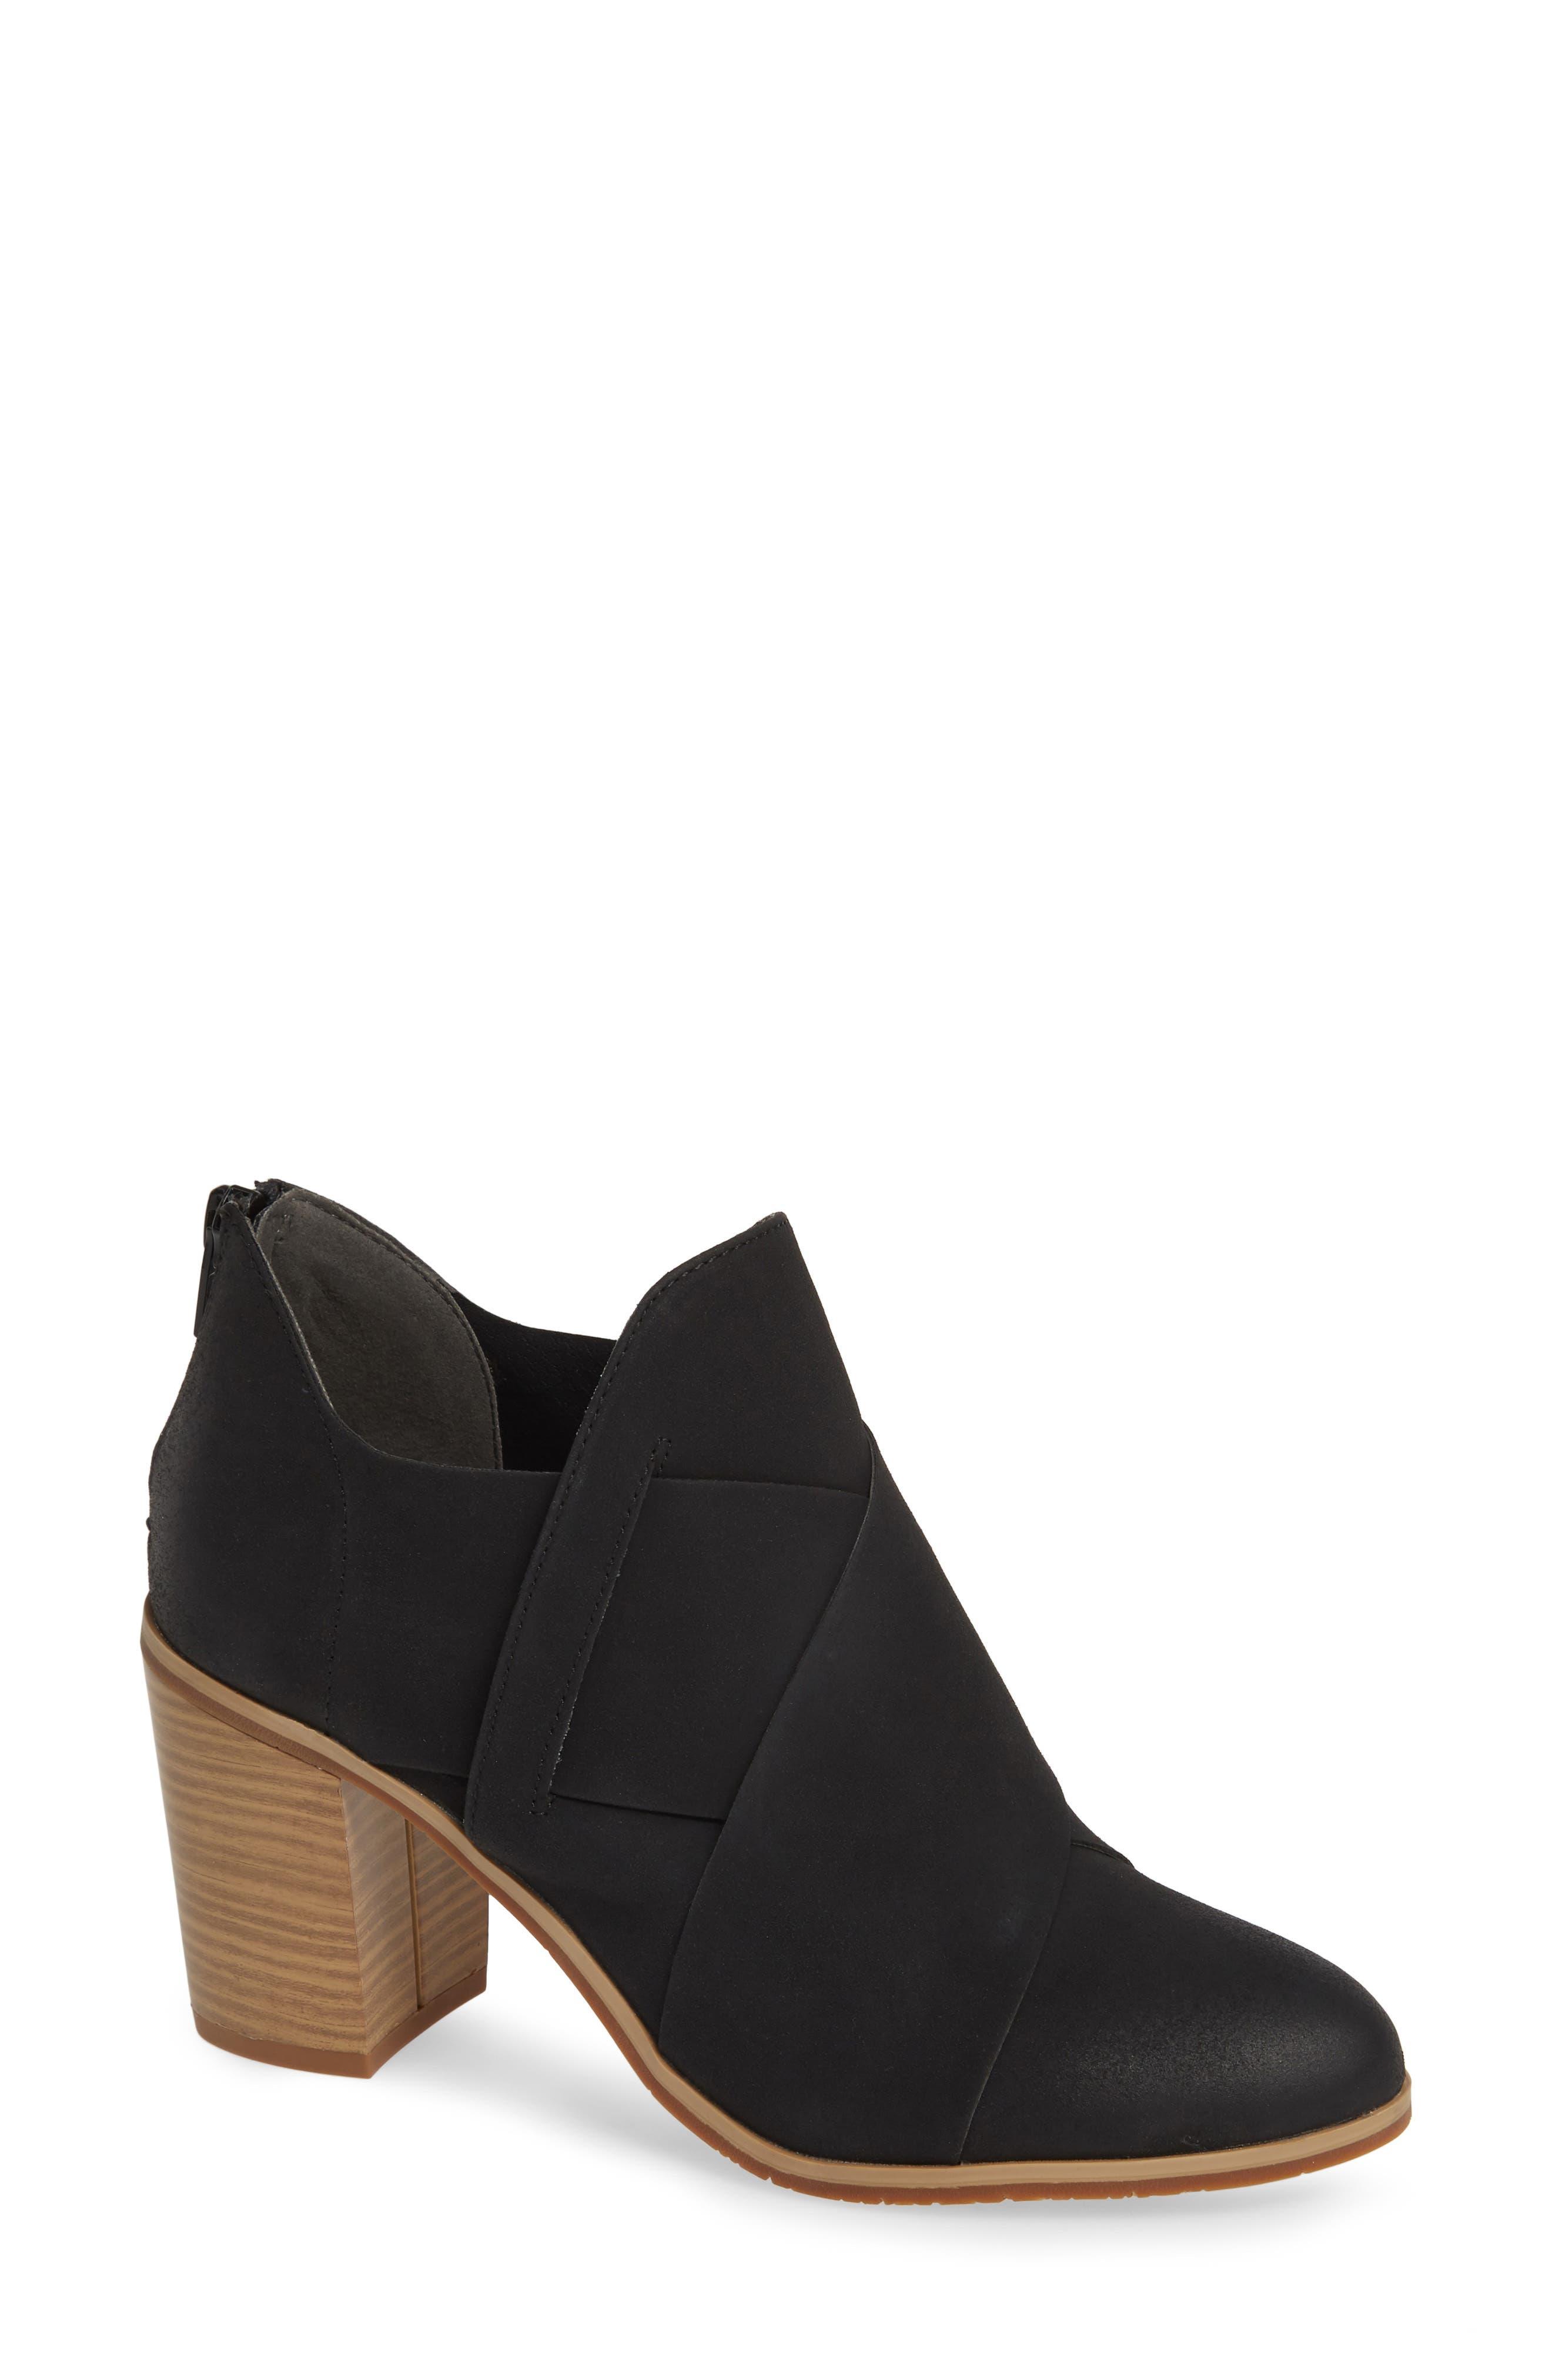 Bc Footwear Azalea Vegan Crisscross Bootie, Black